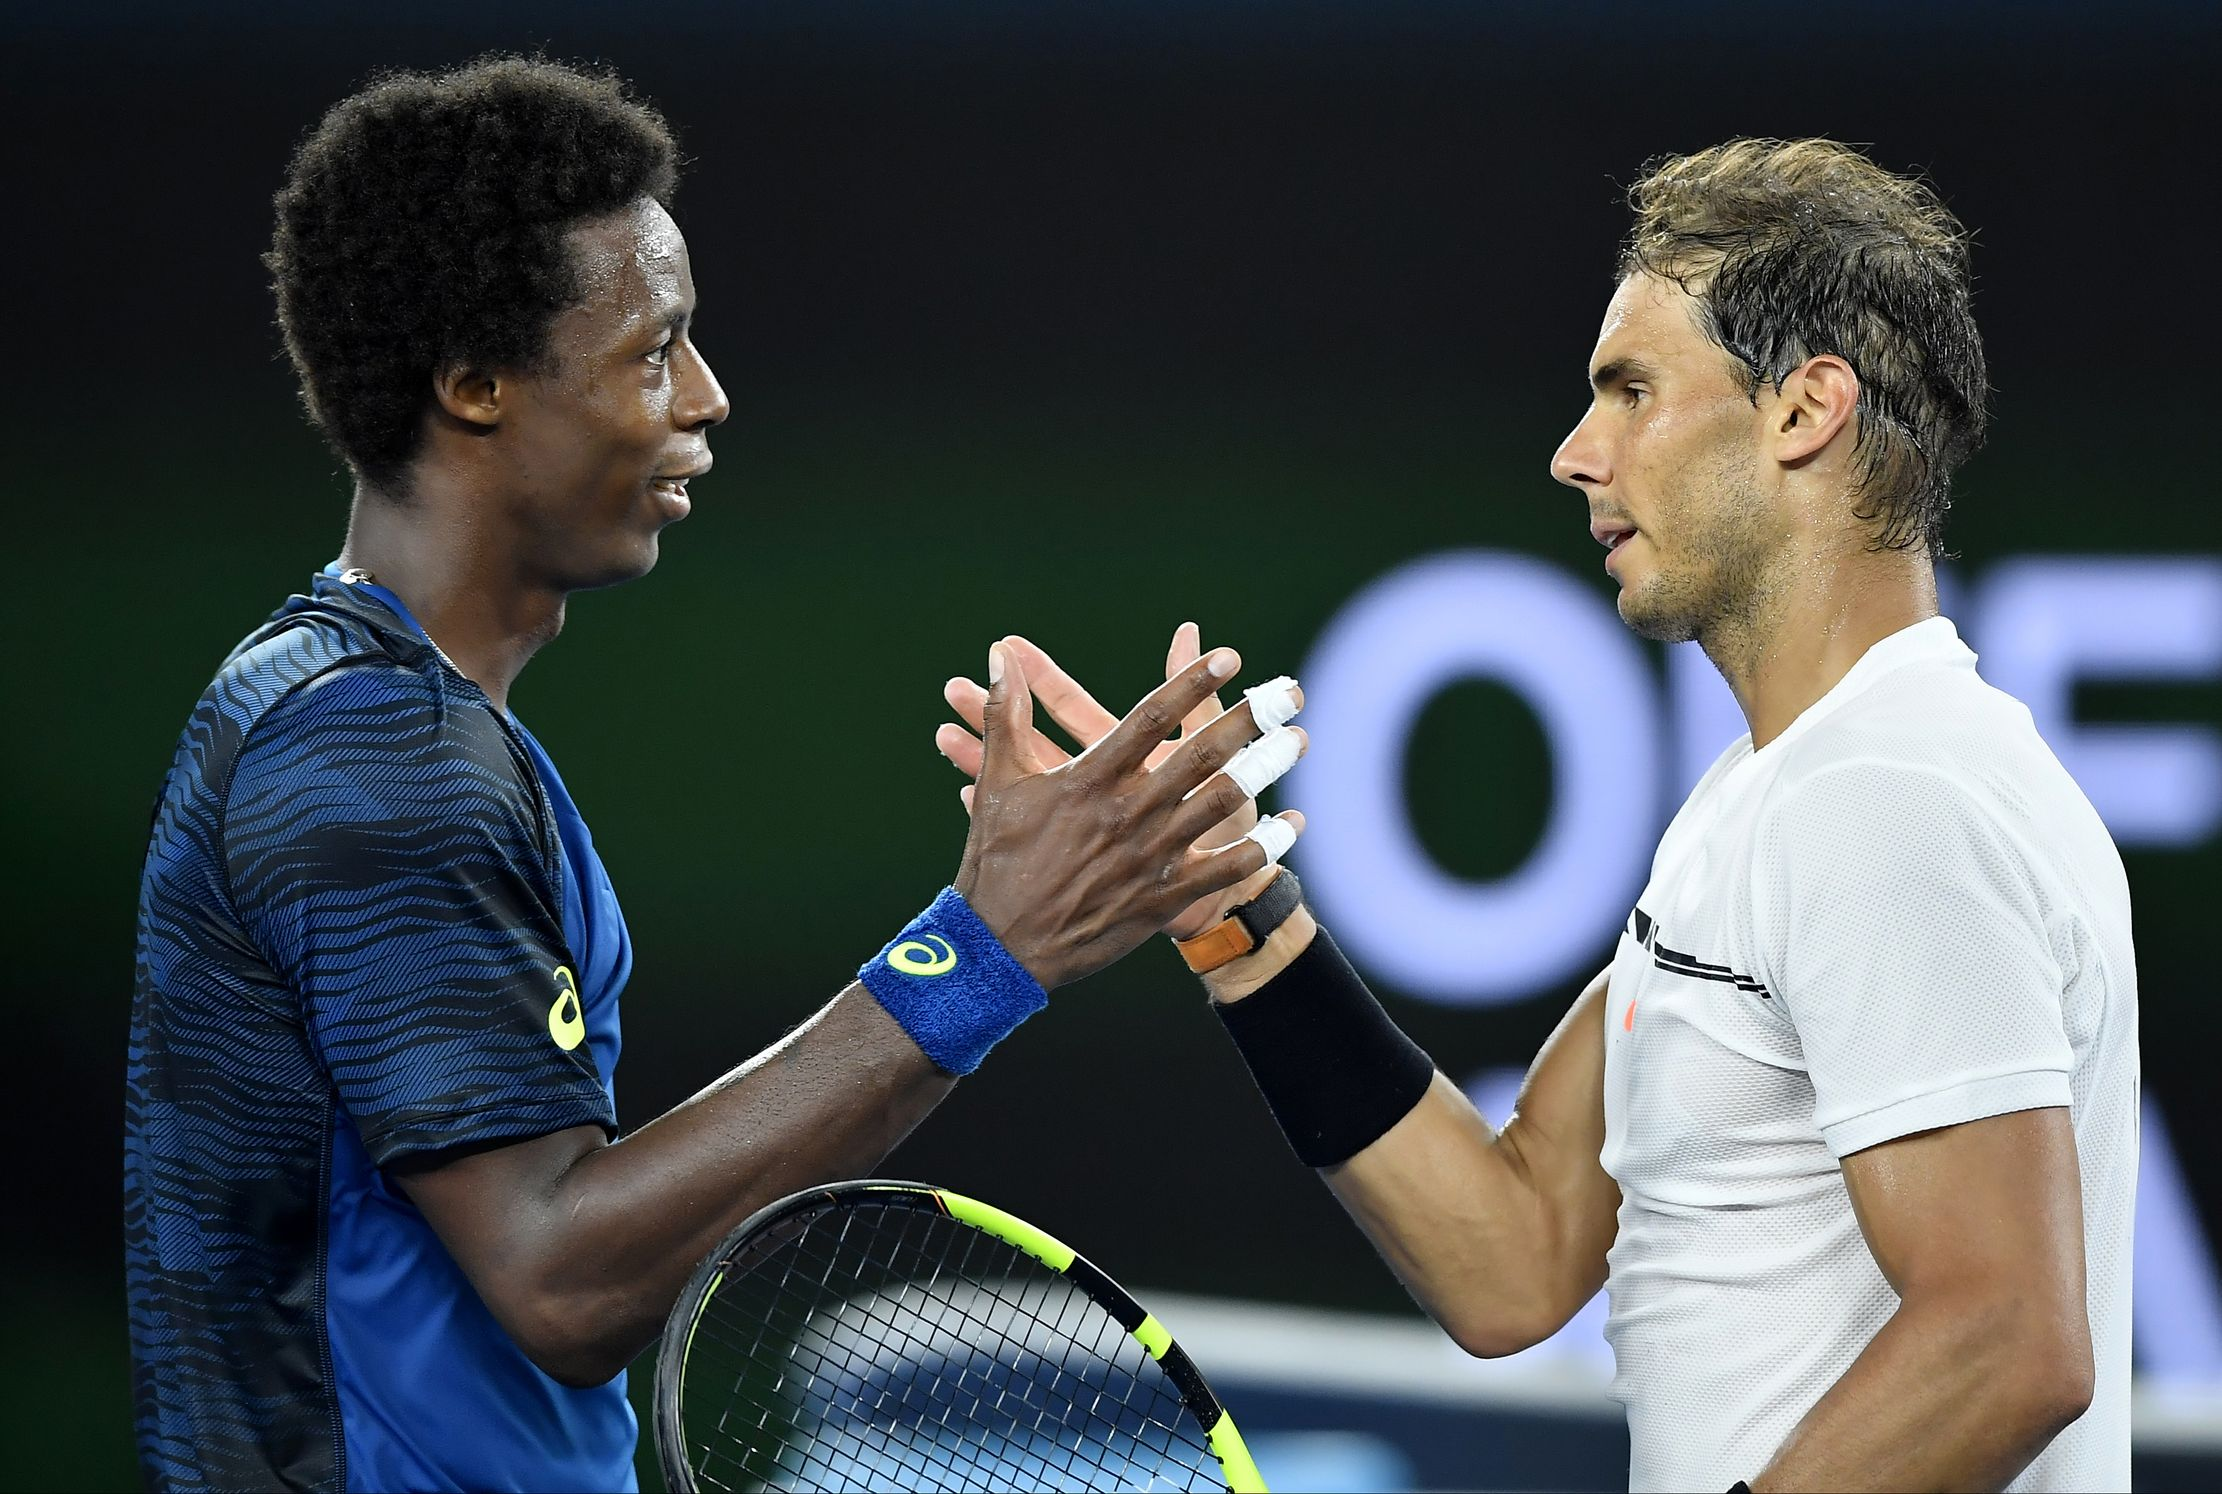 Tennis - Open Australie - Redevenu indestructible, Nadal étouffe Monfils